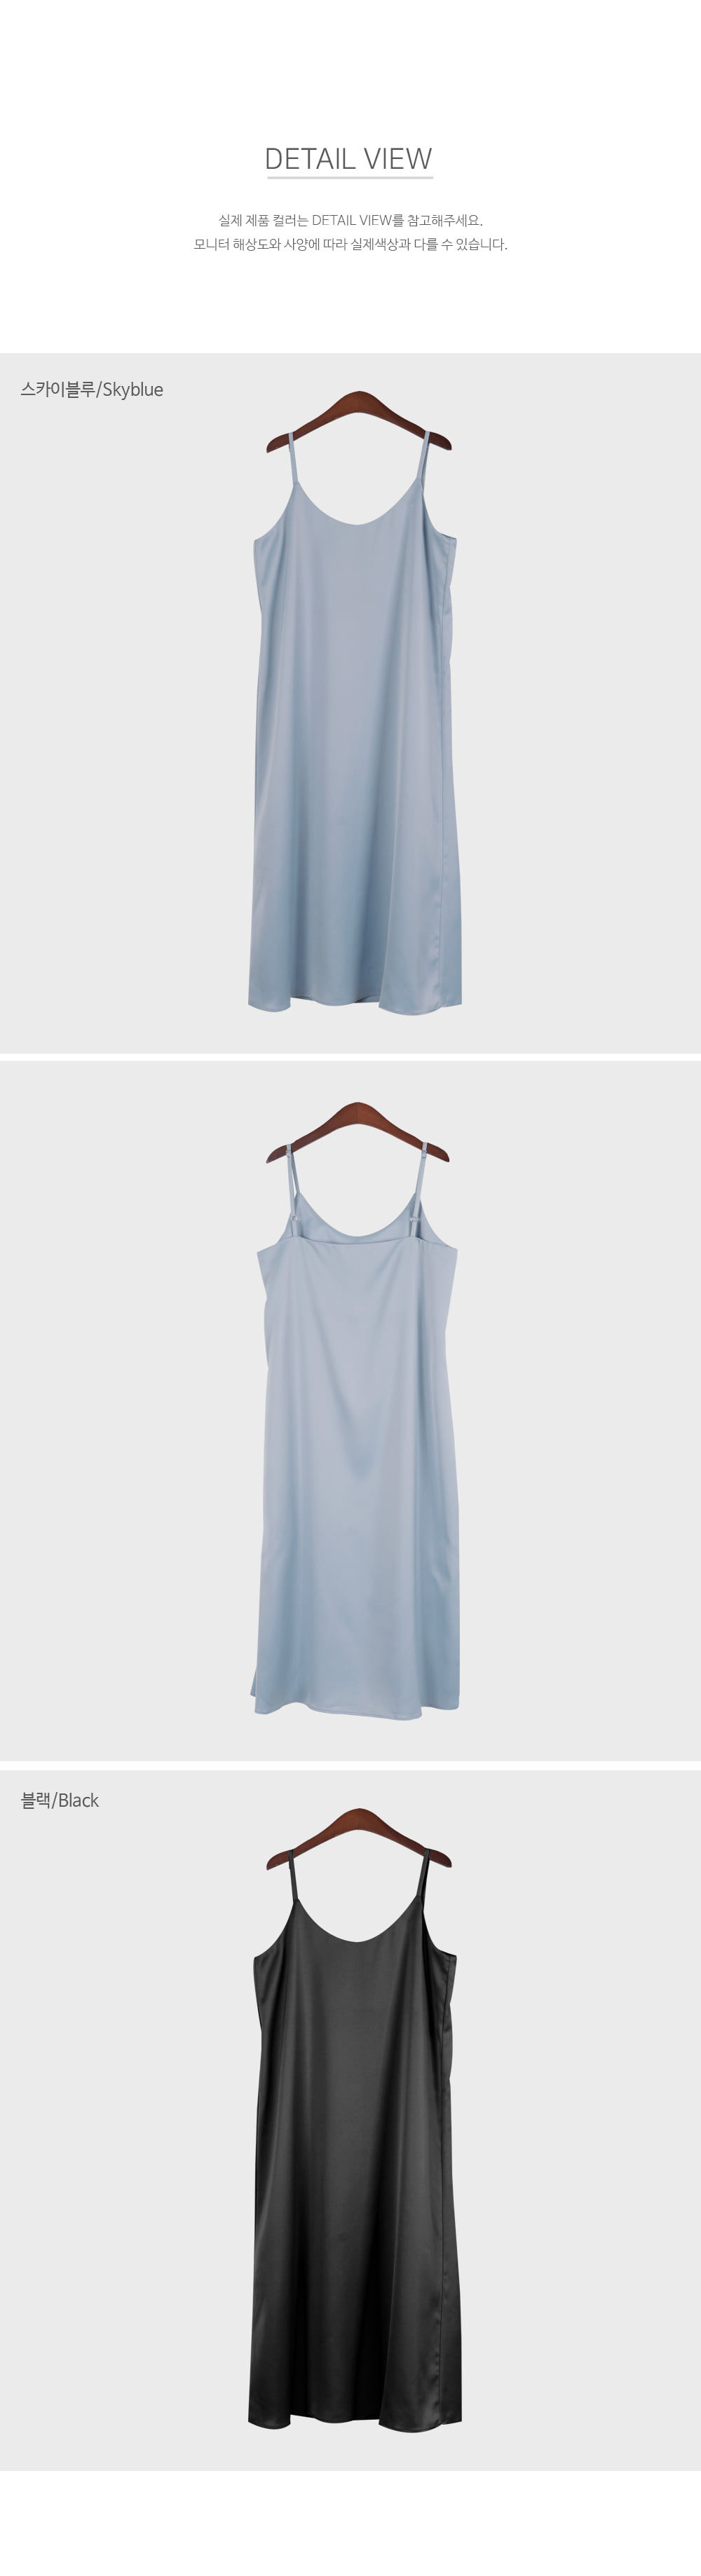 Satin Bustier Dress-holiholic.com